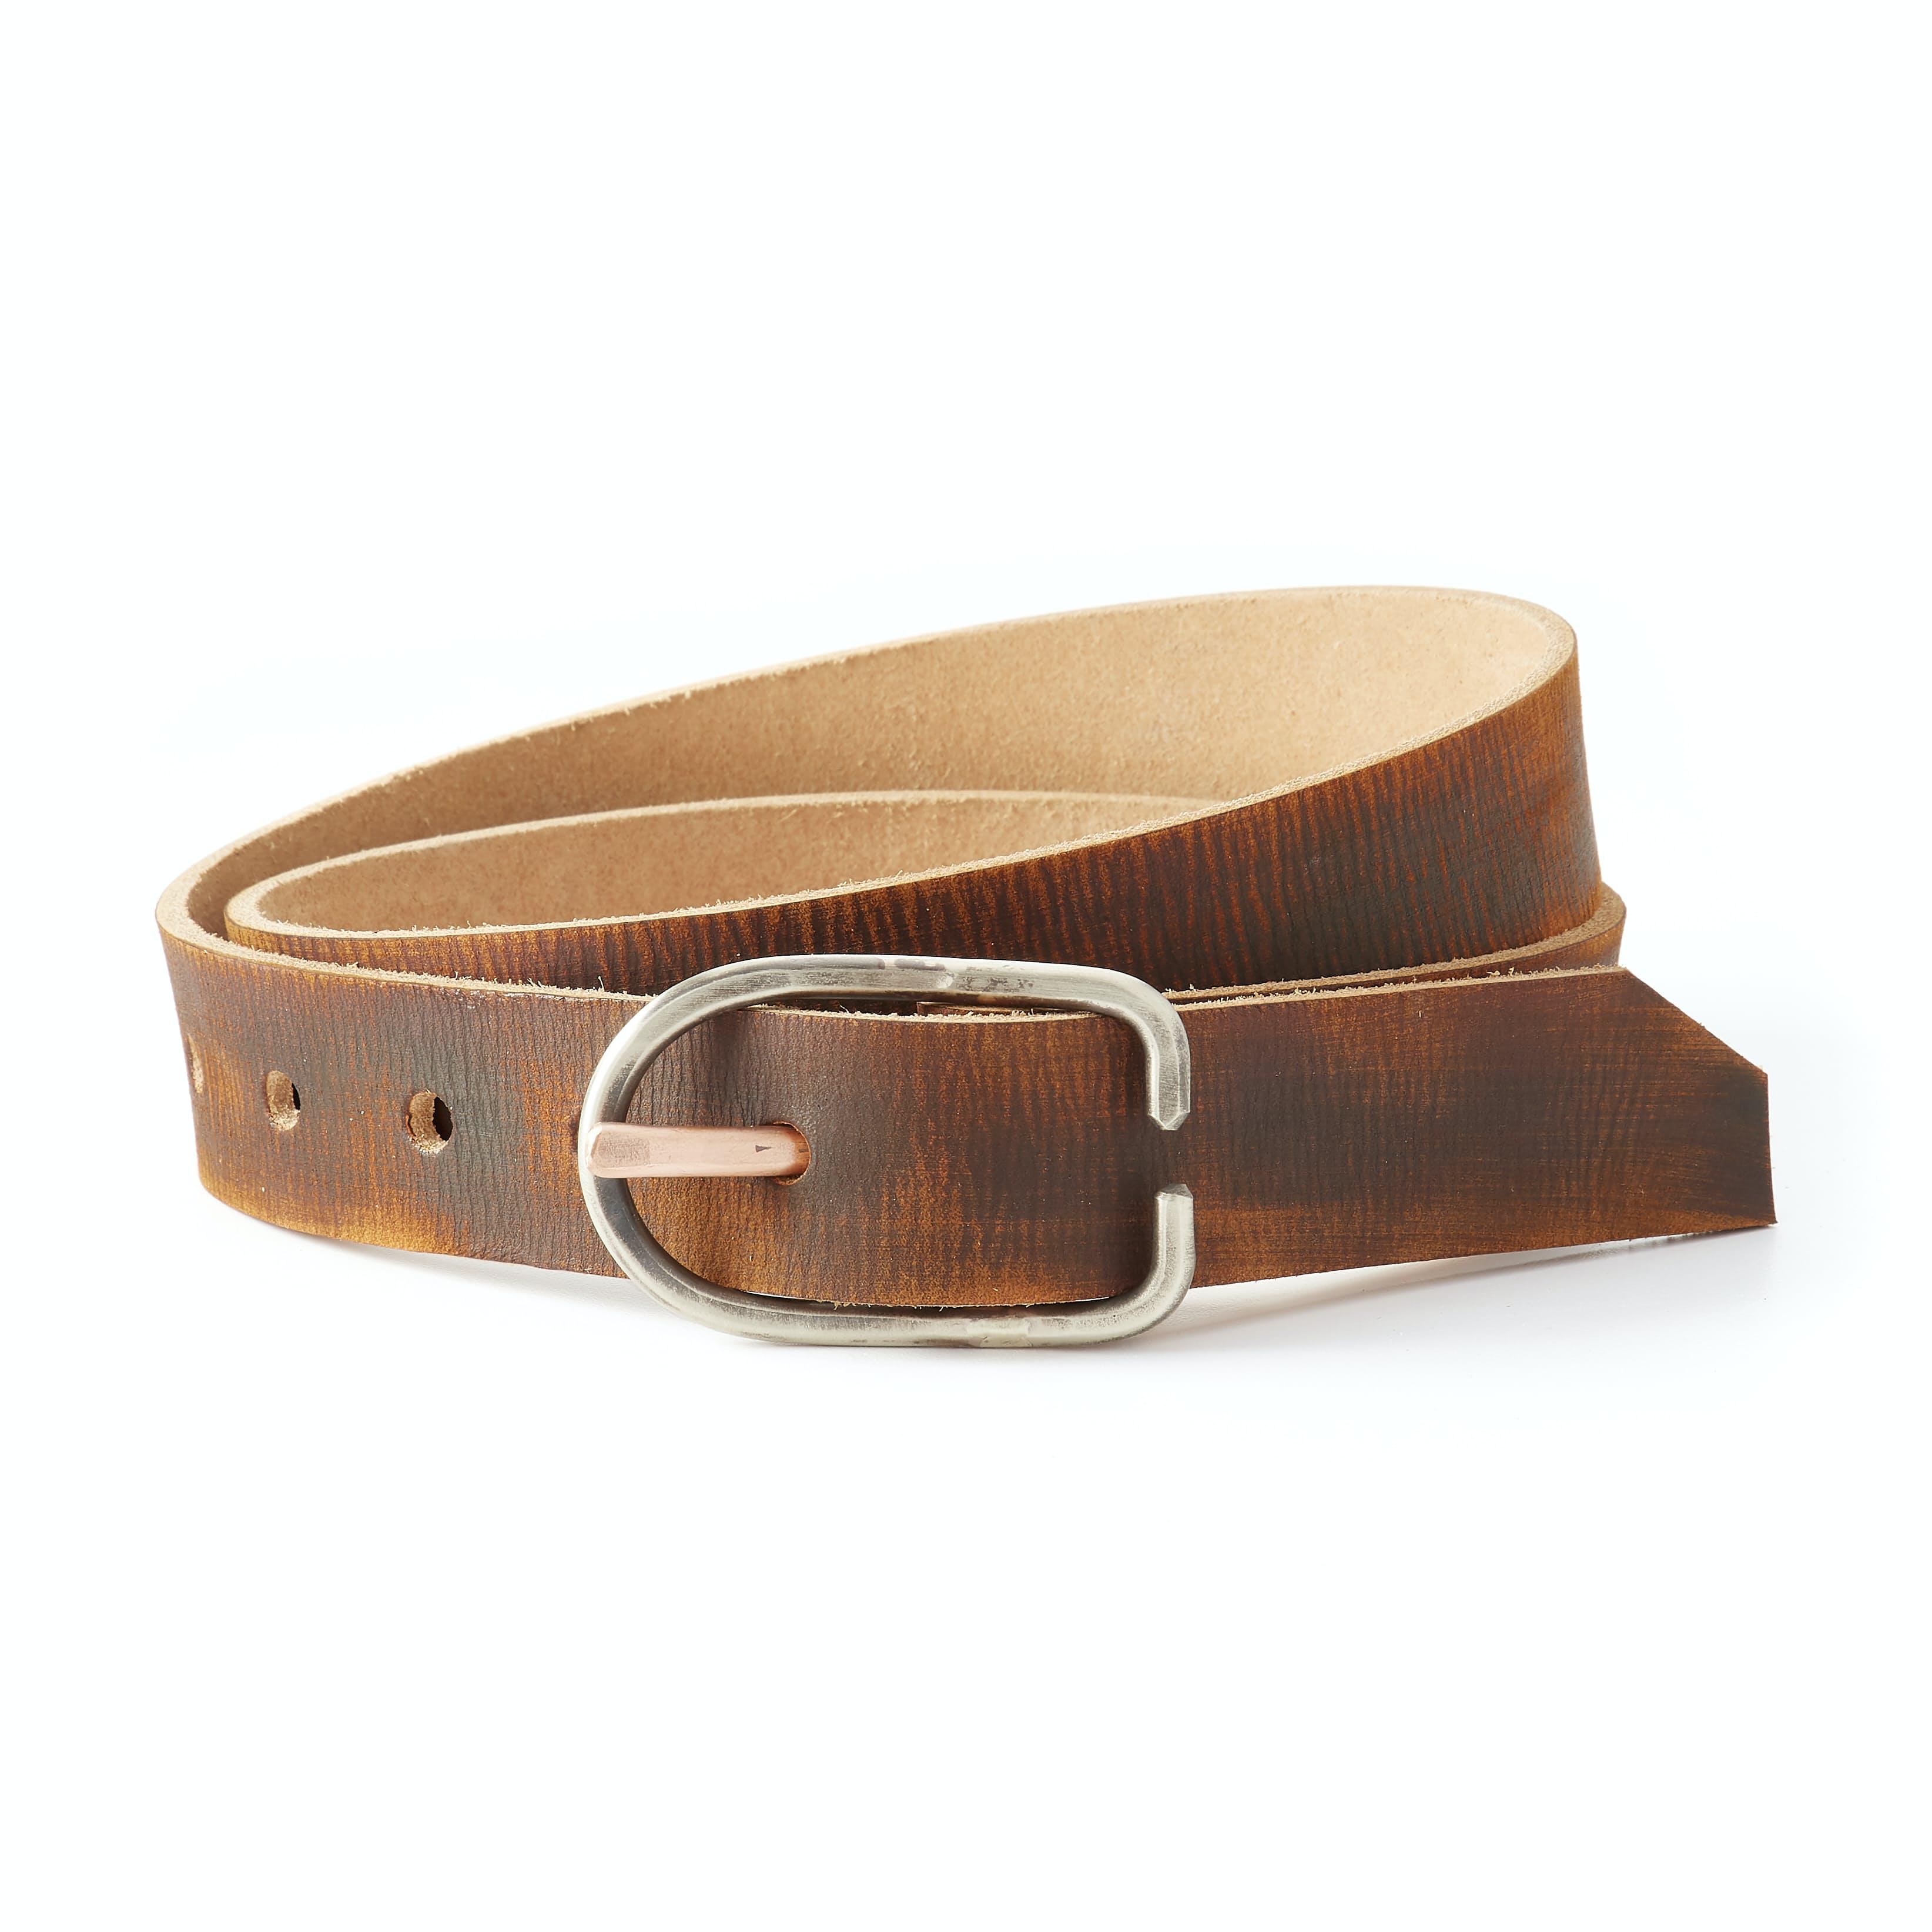 4si09cnzjn cause and effect vintage belt 0 original